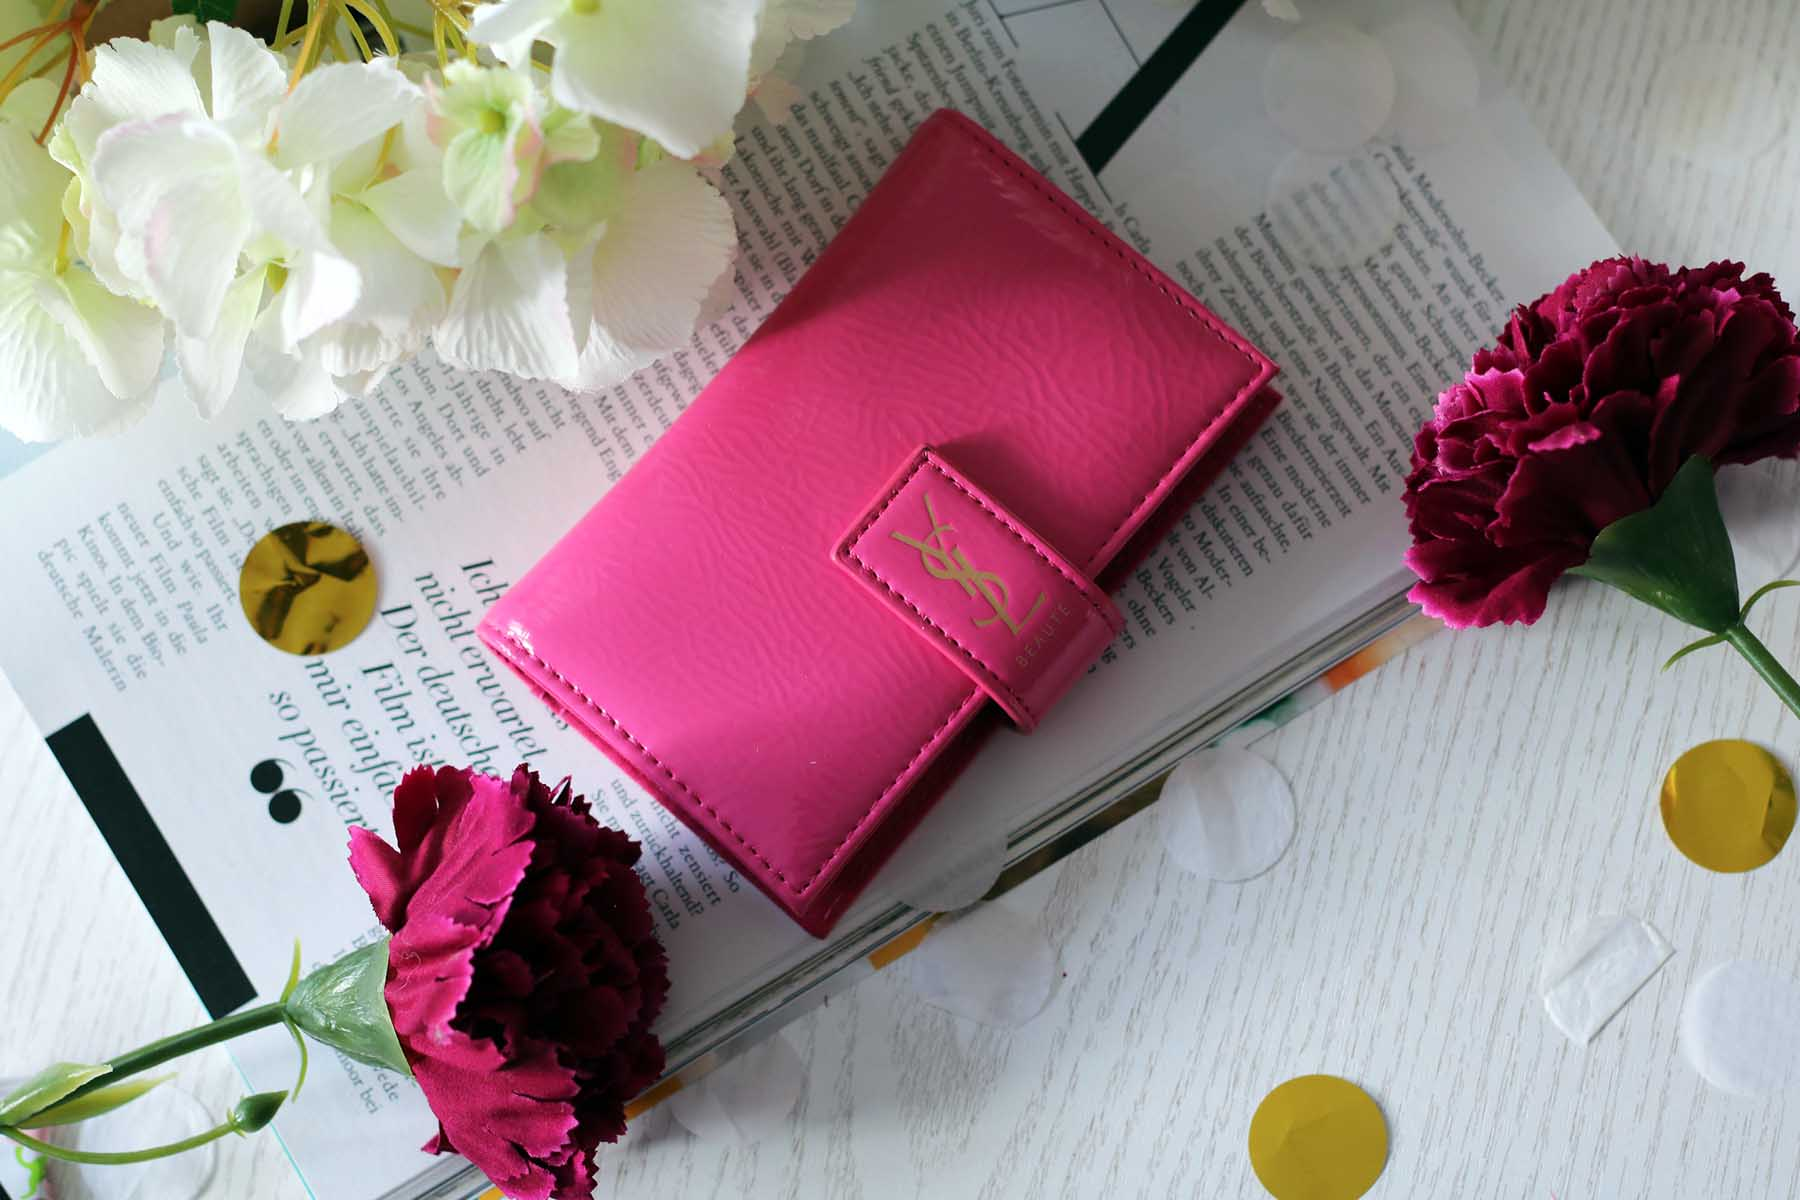 duty-free-shop-düsseldorf-worlddutyfree-yves-saint-laurent-parfüm-manifesto-beautyblog6